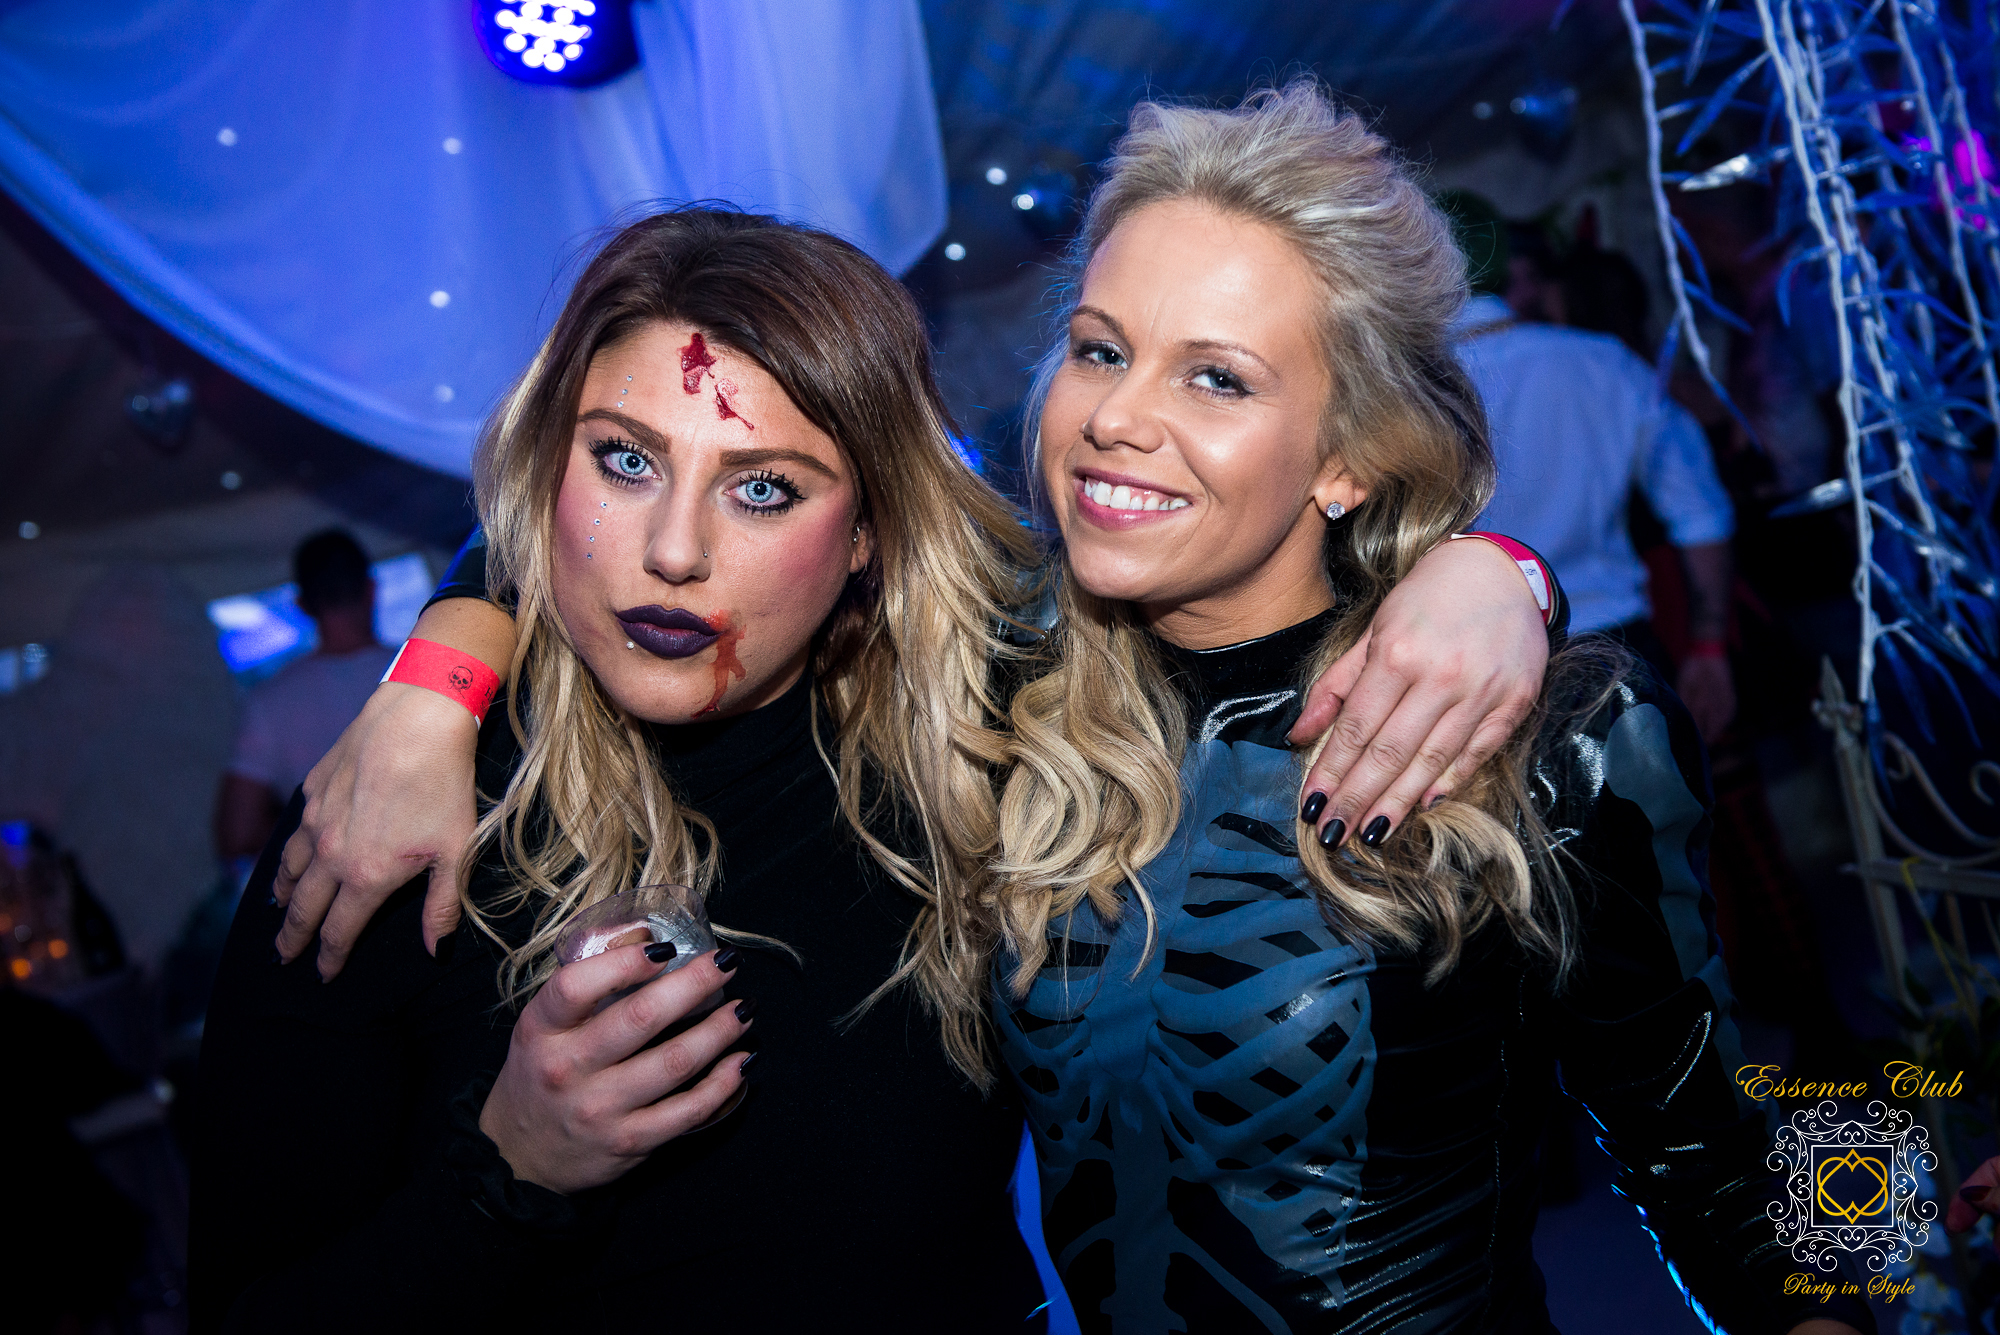 Essence club halloween heaven hell party